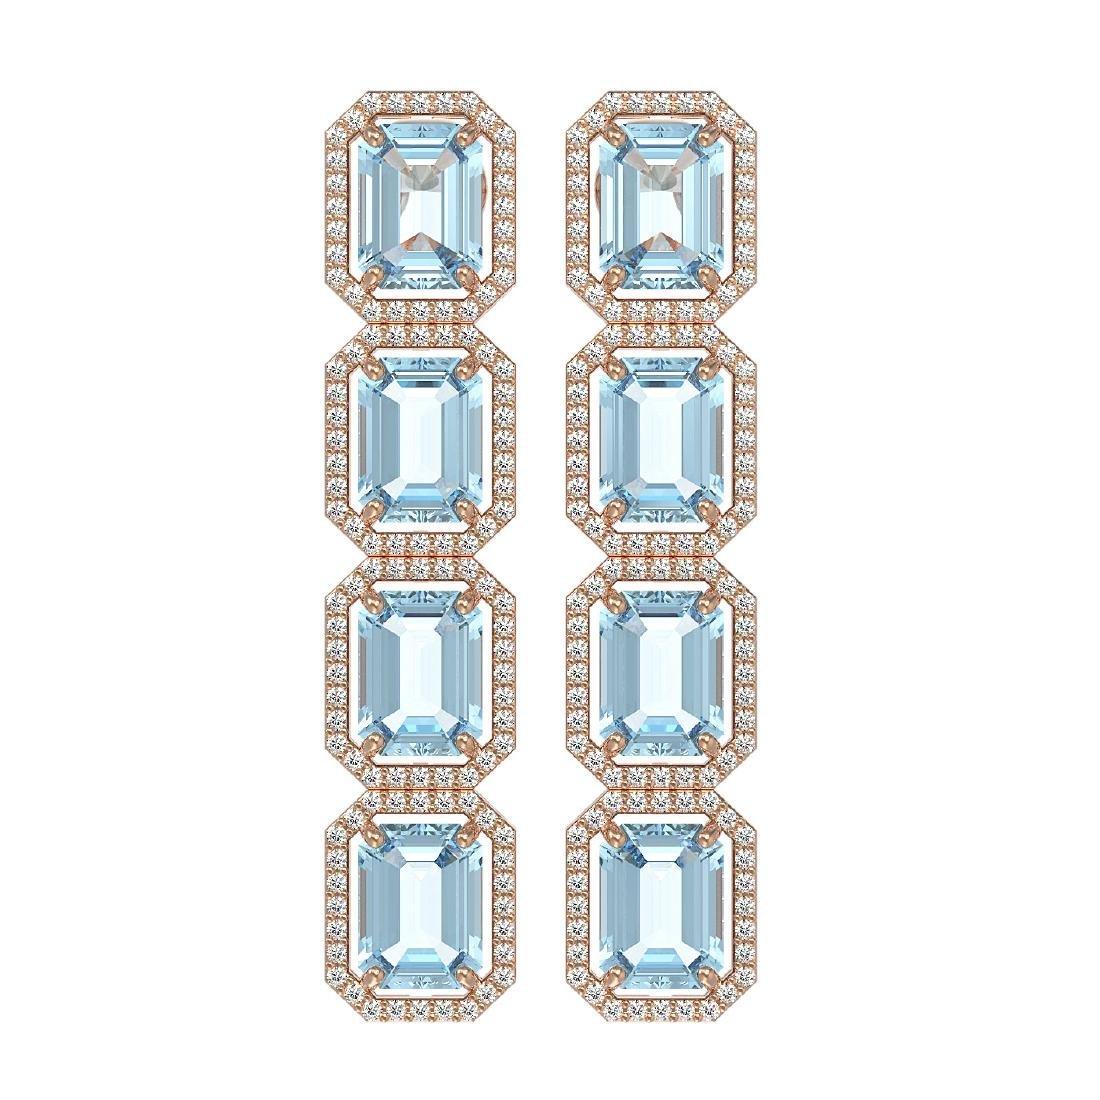 19.49 CTW Aquamarine & Diamond Halo Earrings 10K Rose